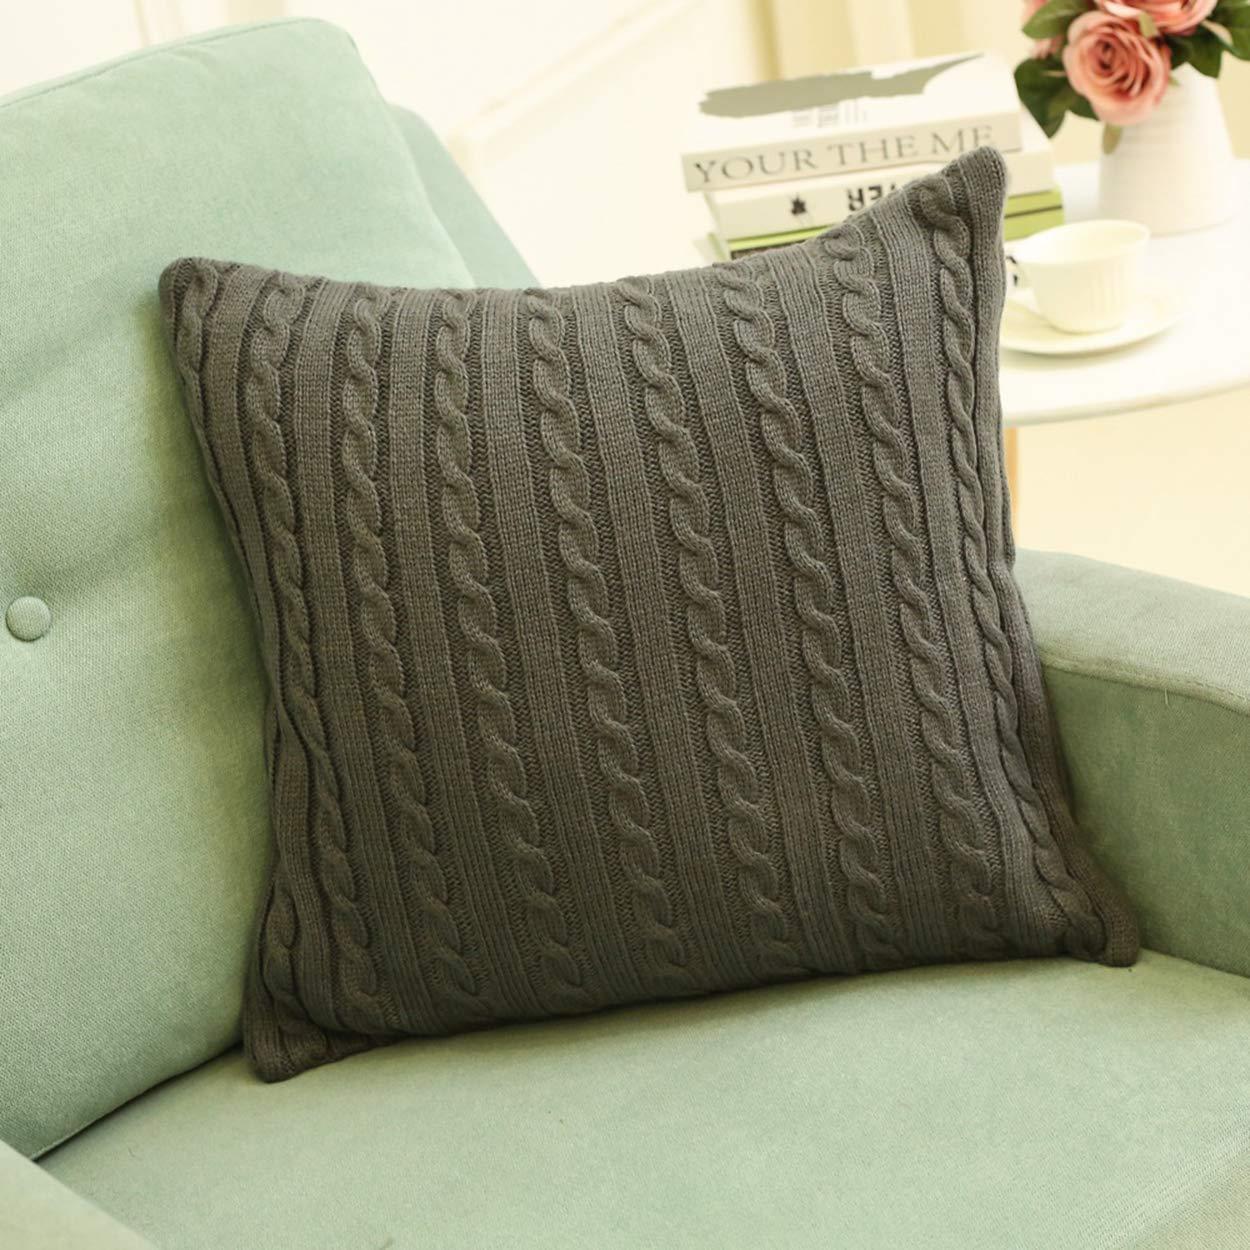 Amazon.com: Cool nik - Funda de cojín cuadrada de algodón ...